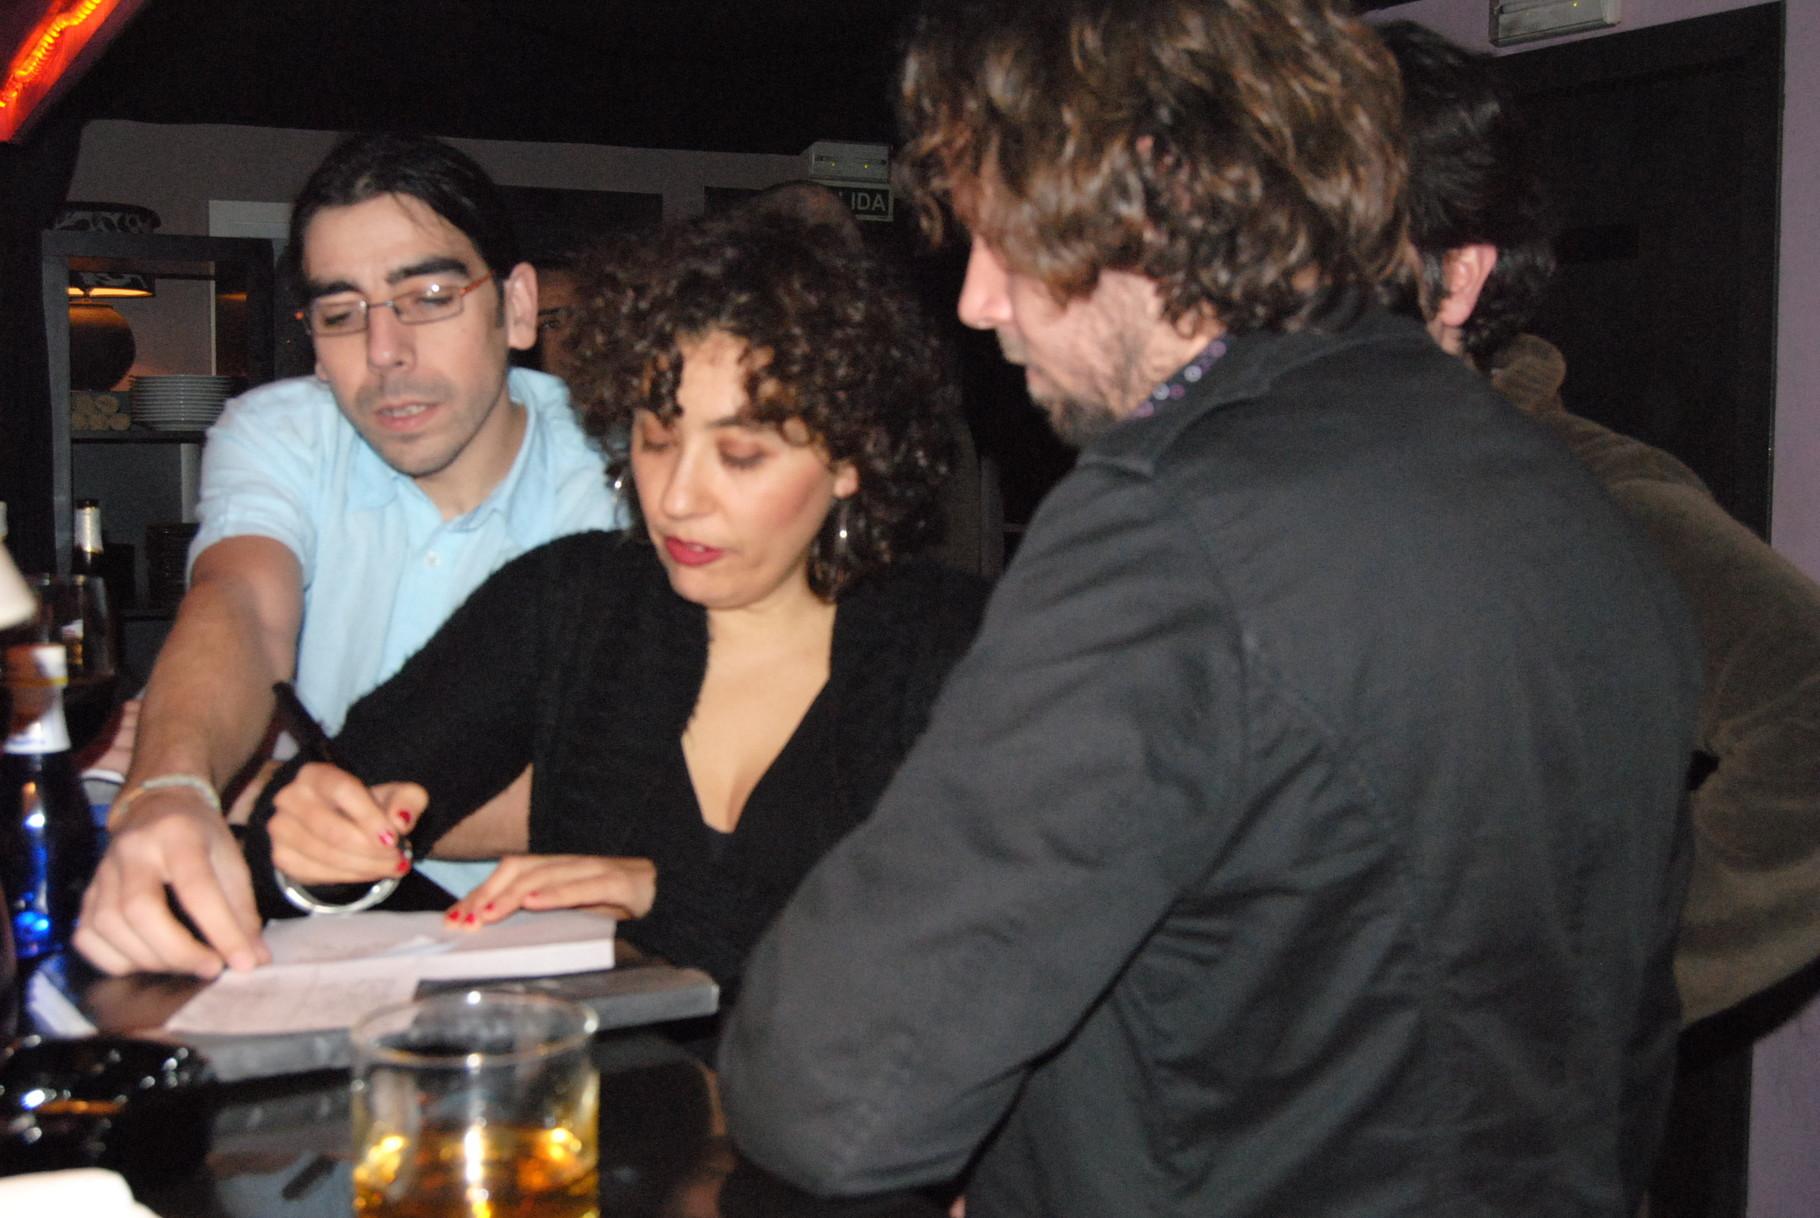 Repasando repertorio. CLUB LESWING, MADRID. MARZO 2010